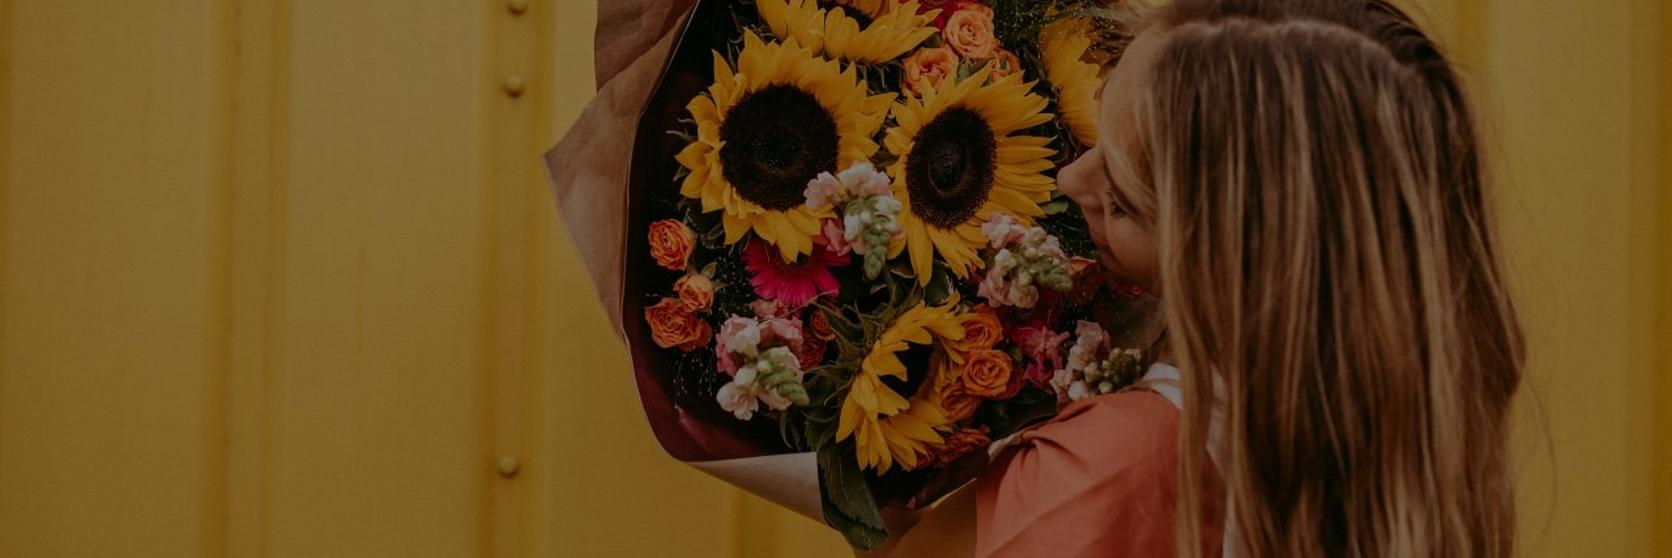 Beautiful-flowers-feature-image-talesofboys